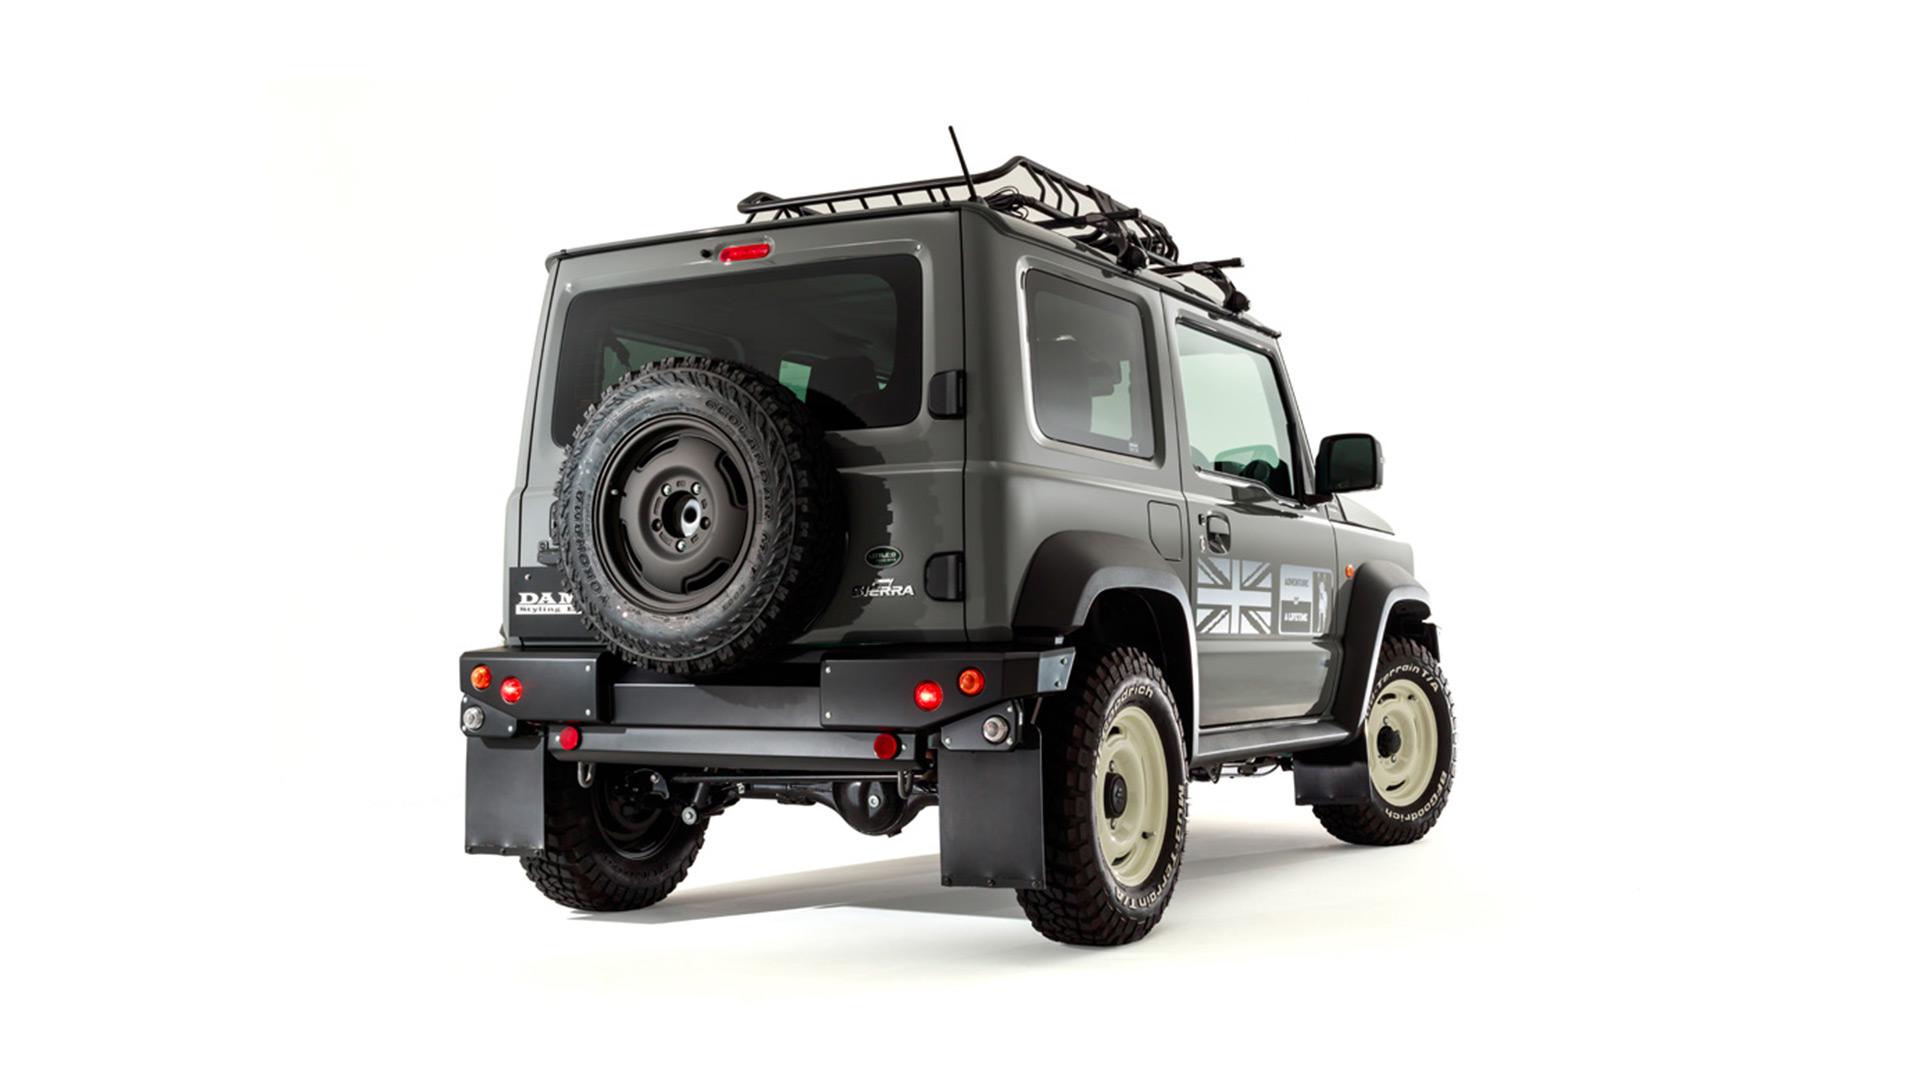 DAMD Suzuki Jimny Defender Kit